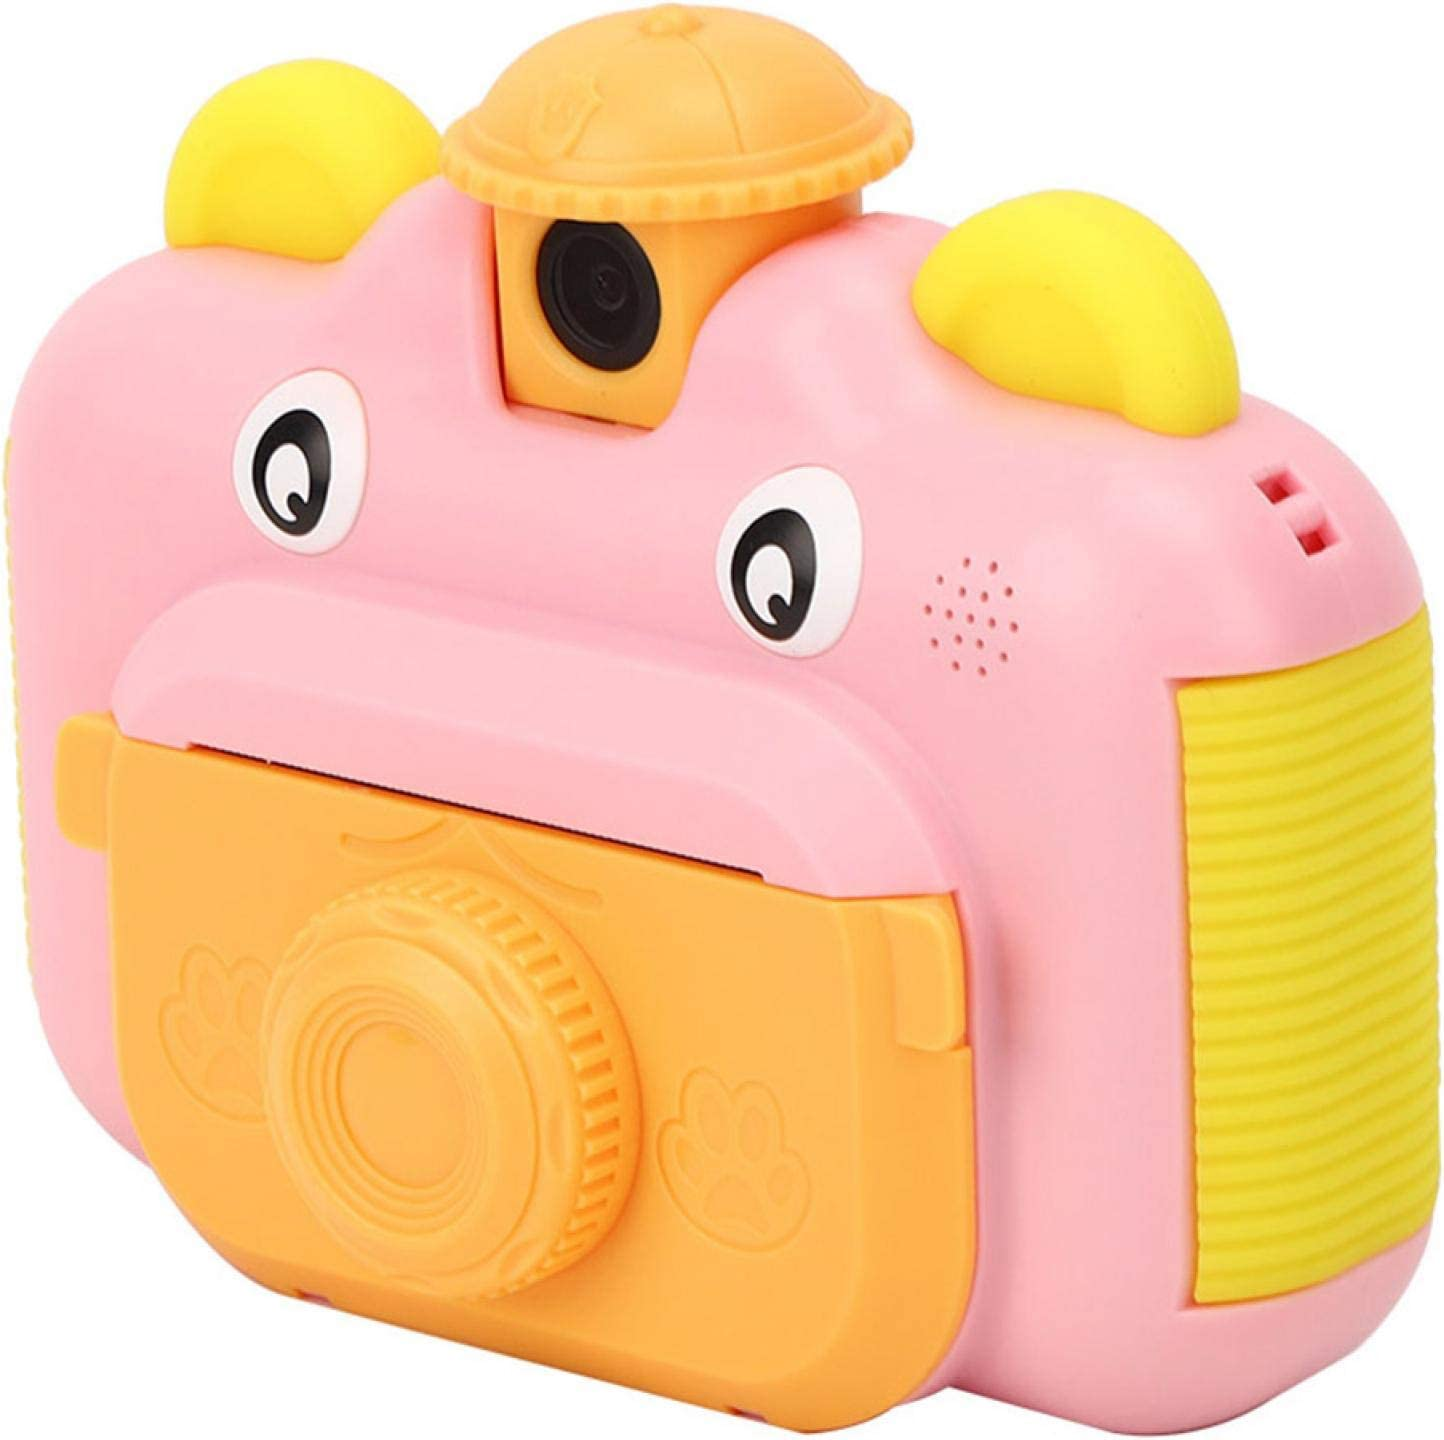 Max 43% OFF Kid Camera Dedication Digital Instant DIY Toy Ki Cute ABS Portable